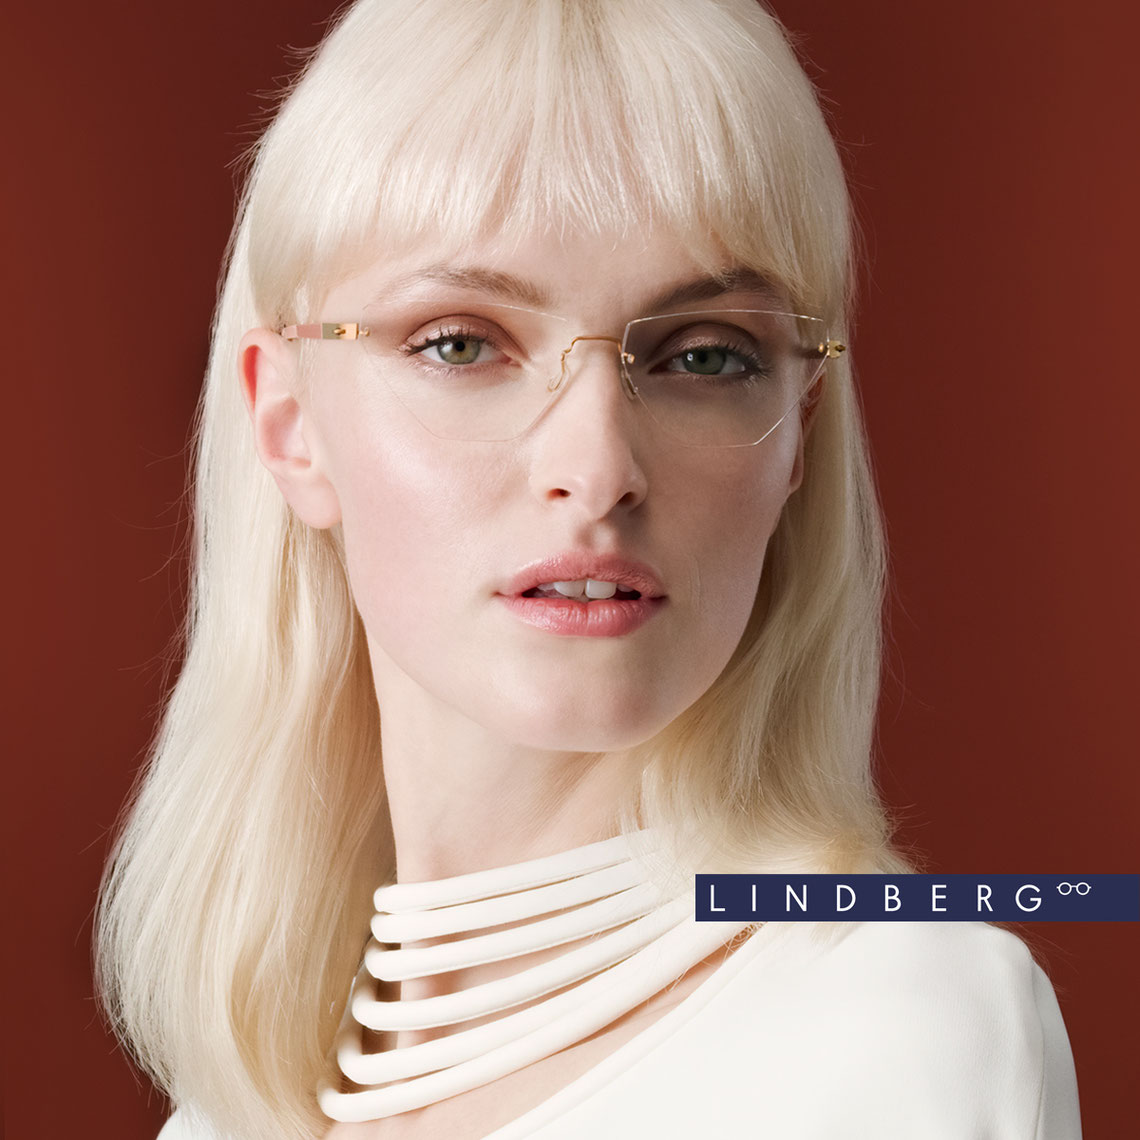 Lindberg #Randlosbrille #Titanbrille #Optiker Zacher #Optiker in Thüringen